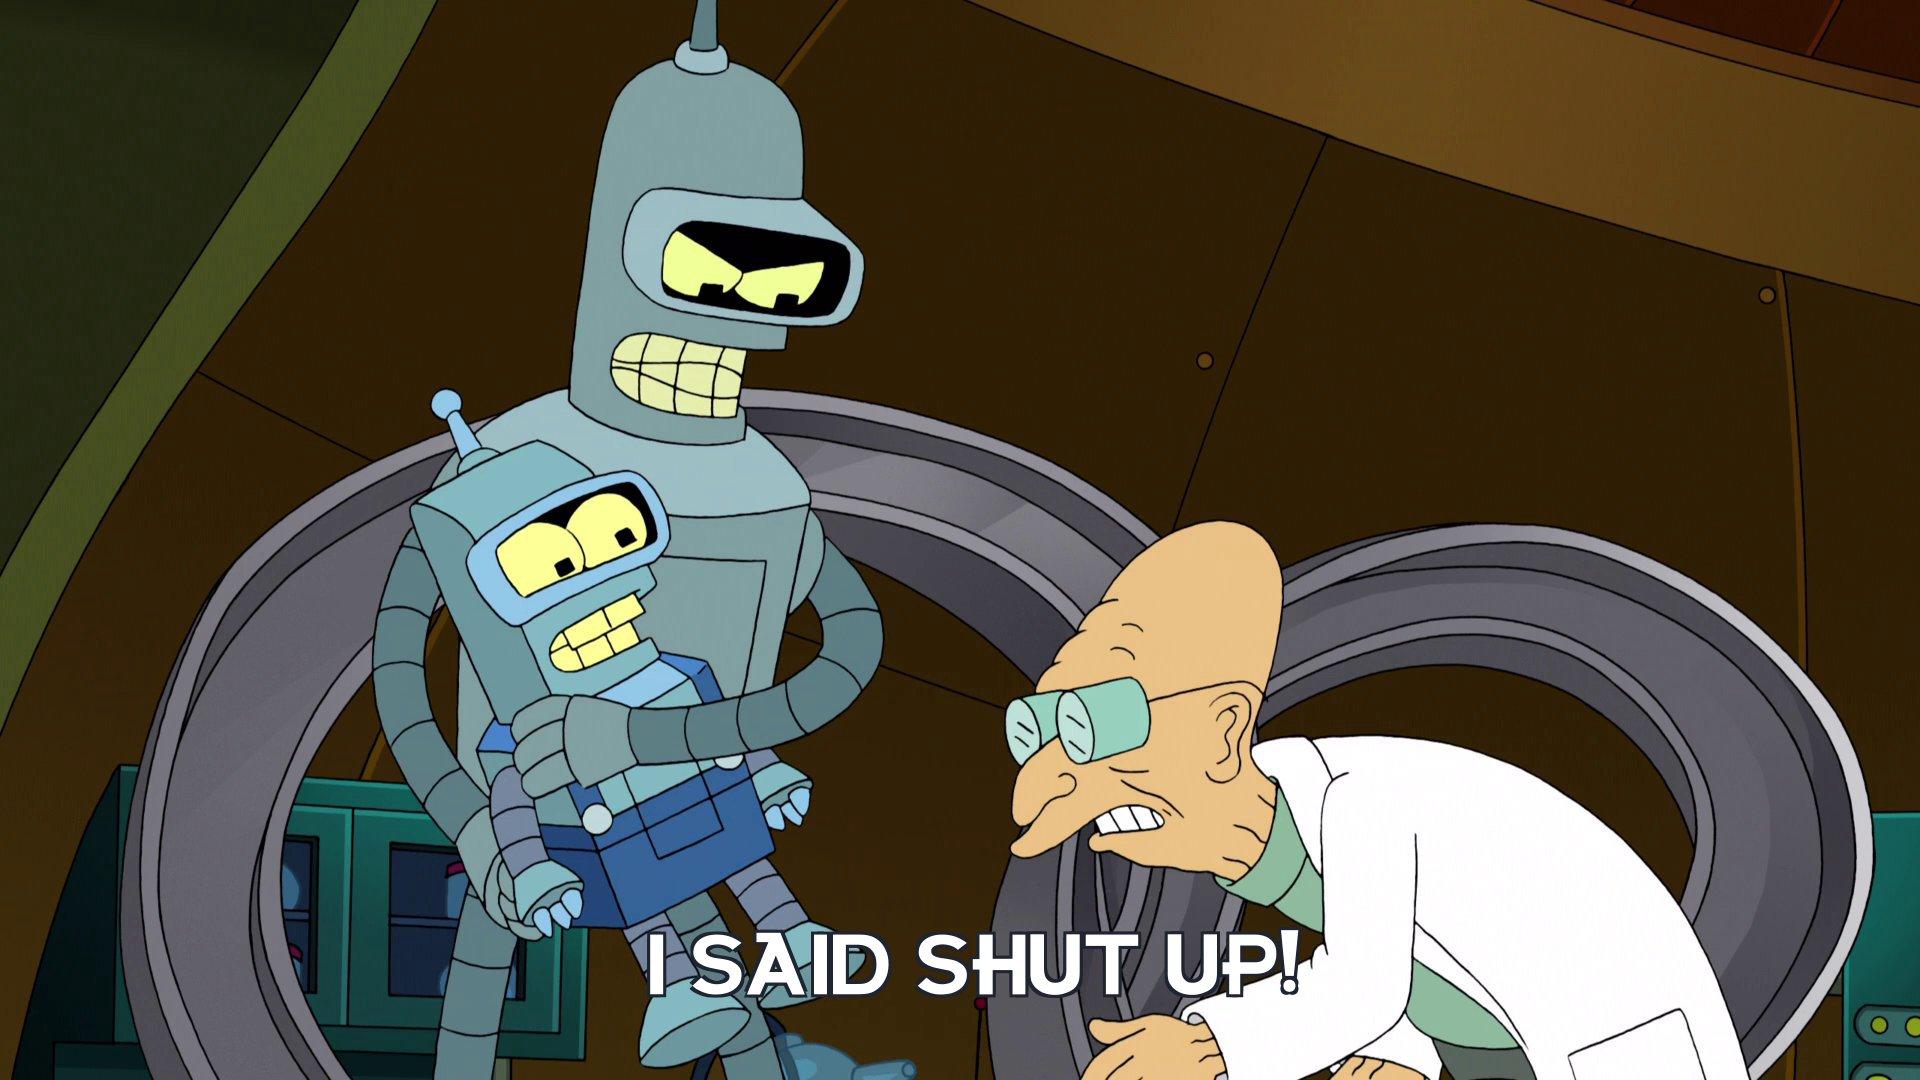 Bender Bending Rodriguez: I said shut up!